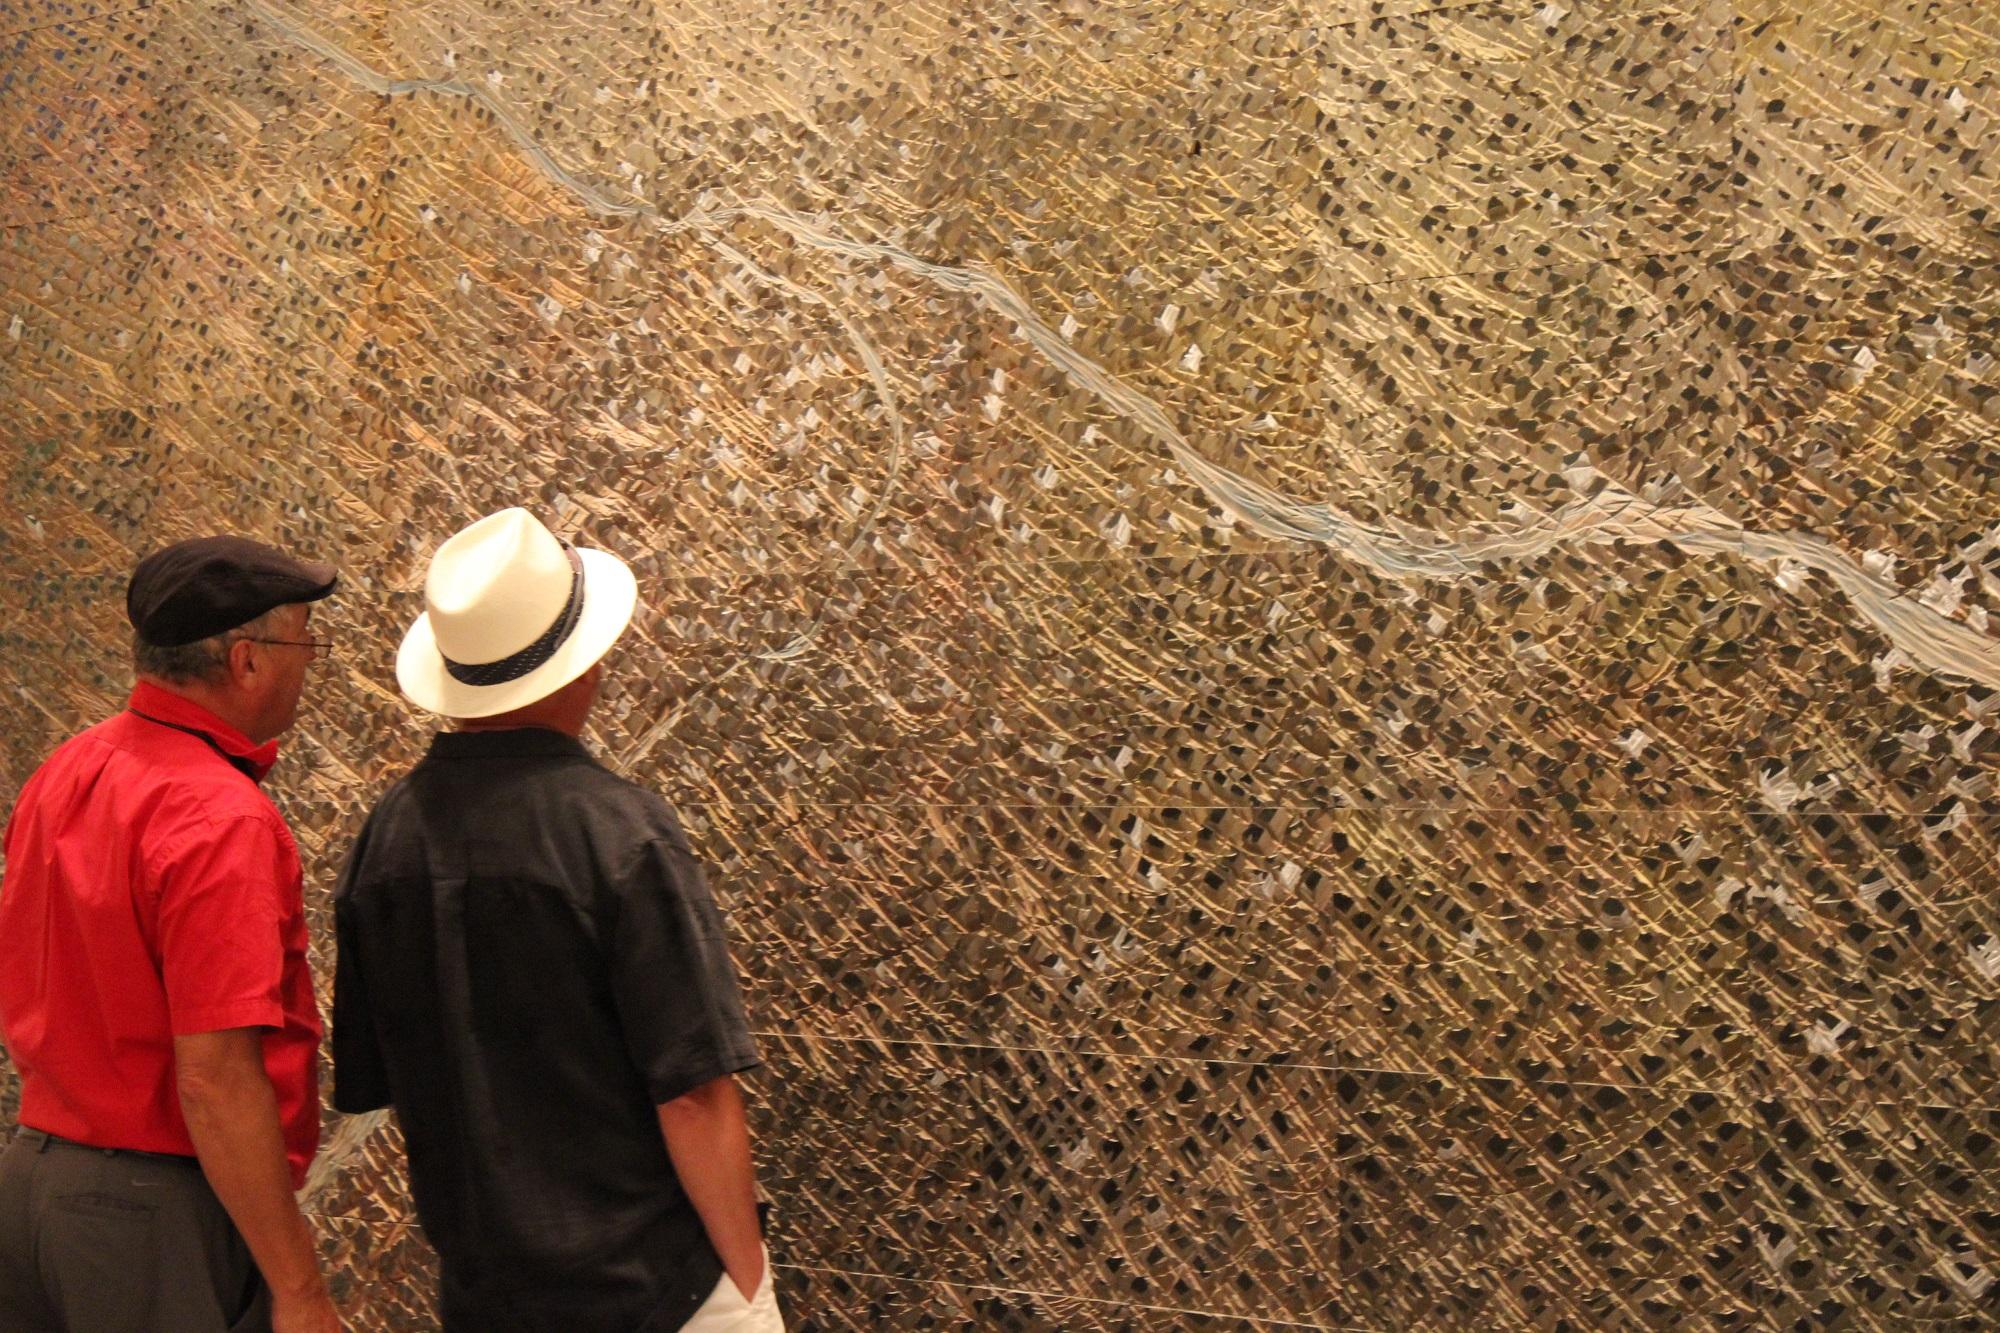 Frank Schroeder Bill Lowe Gallery Opening 25.JPG